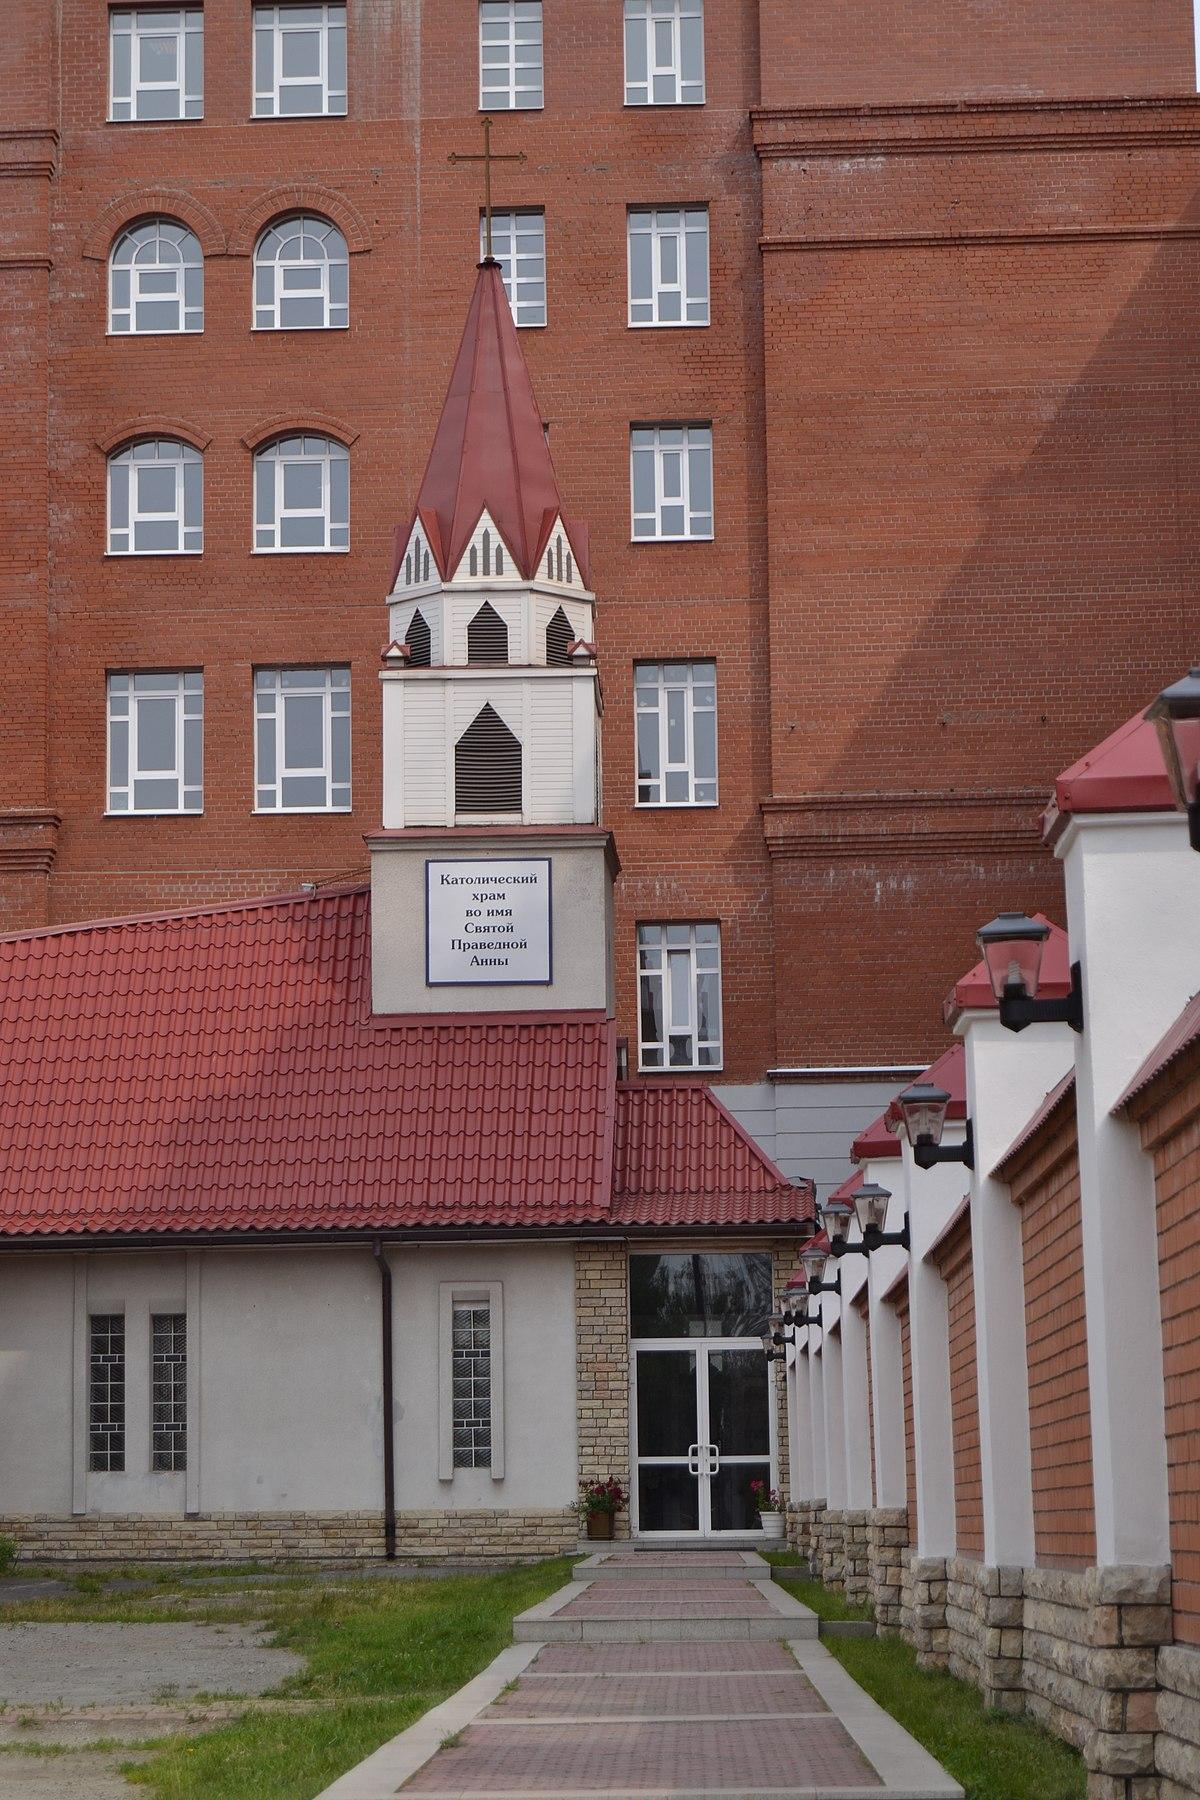 st annes church yekaterinburg wikipedia